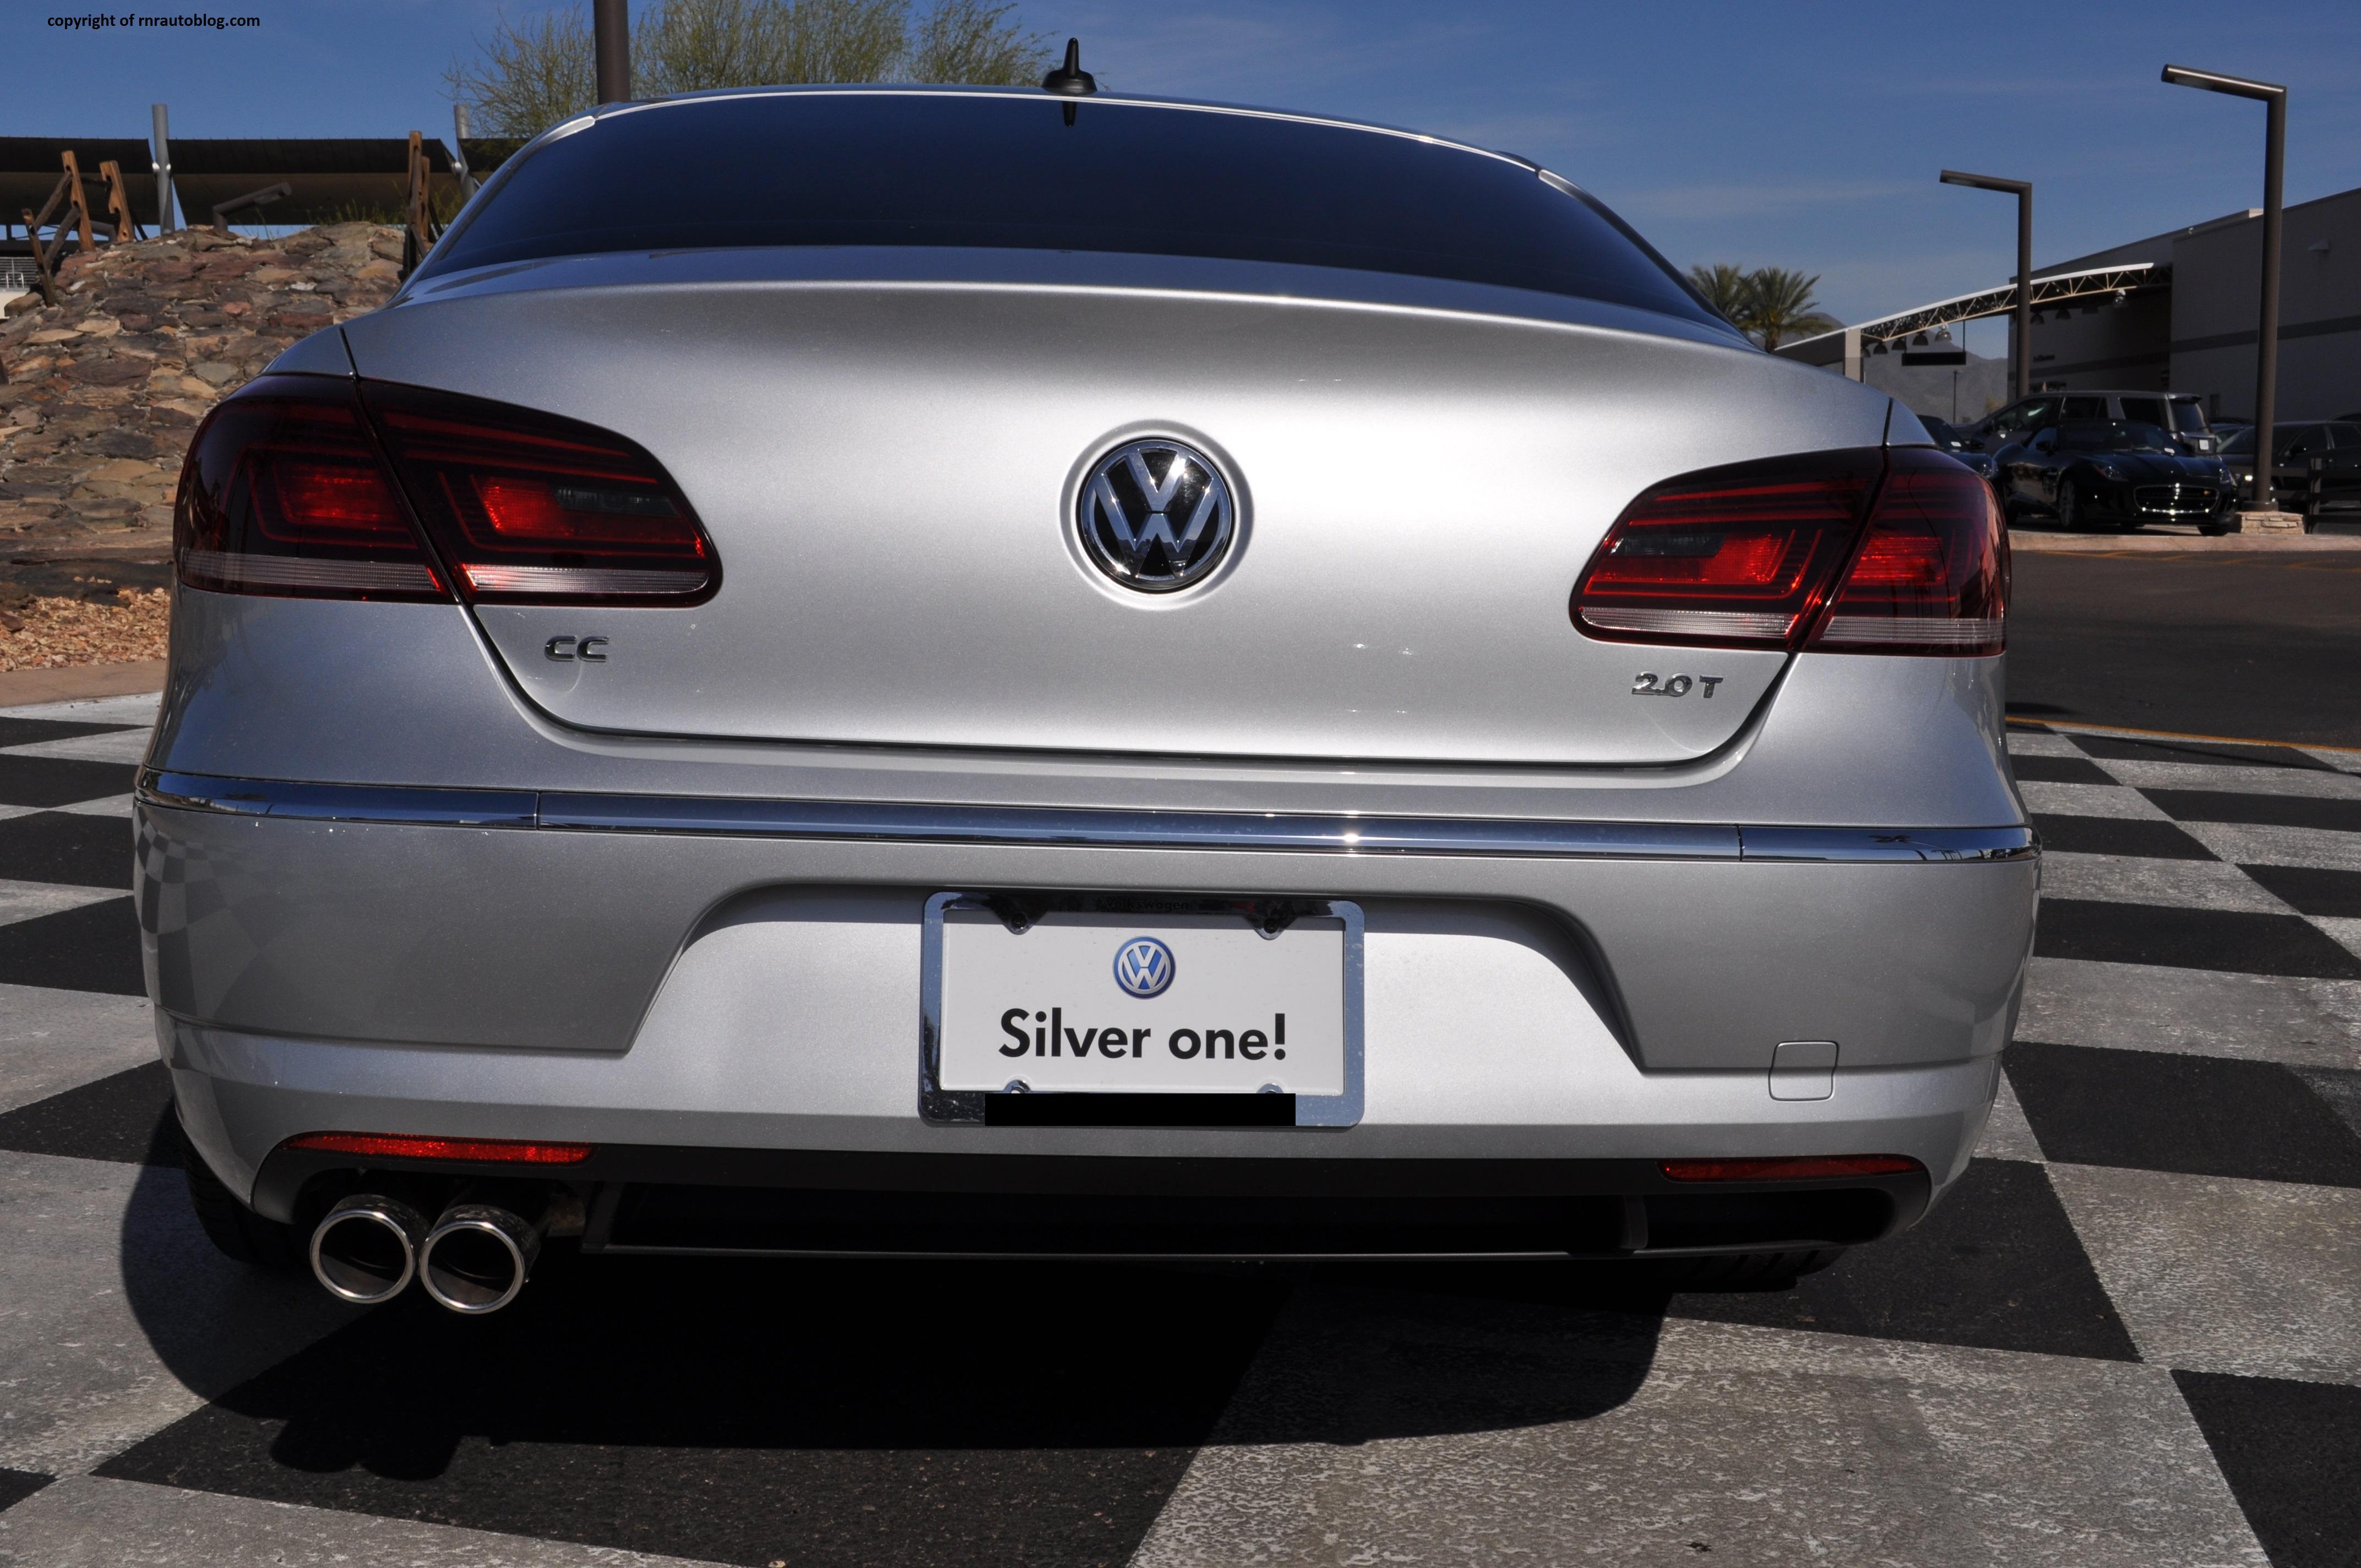 Volkswagen Passat CC I 2008 - 2012 Sedan #1